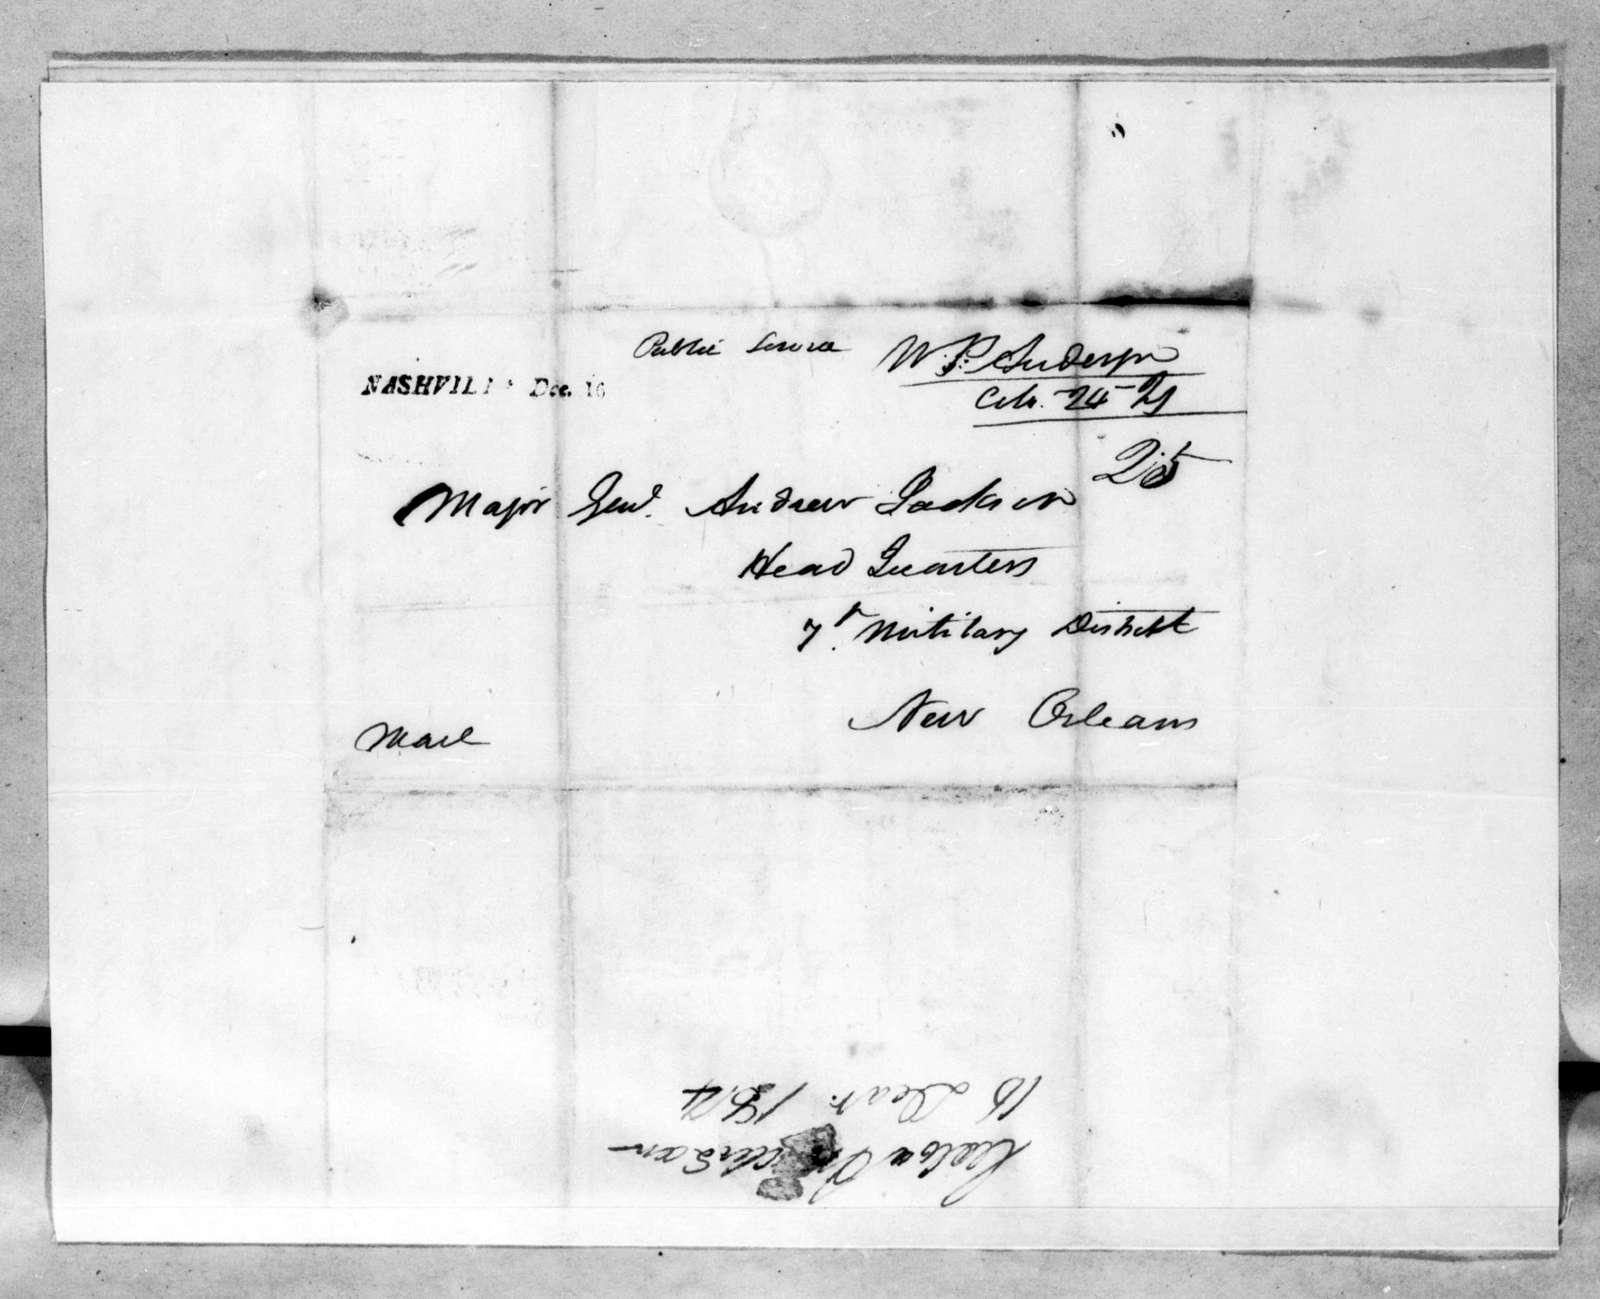 William Preston Anderson to Andrew Jackson, December 16, 1814